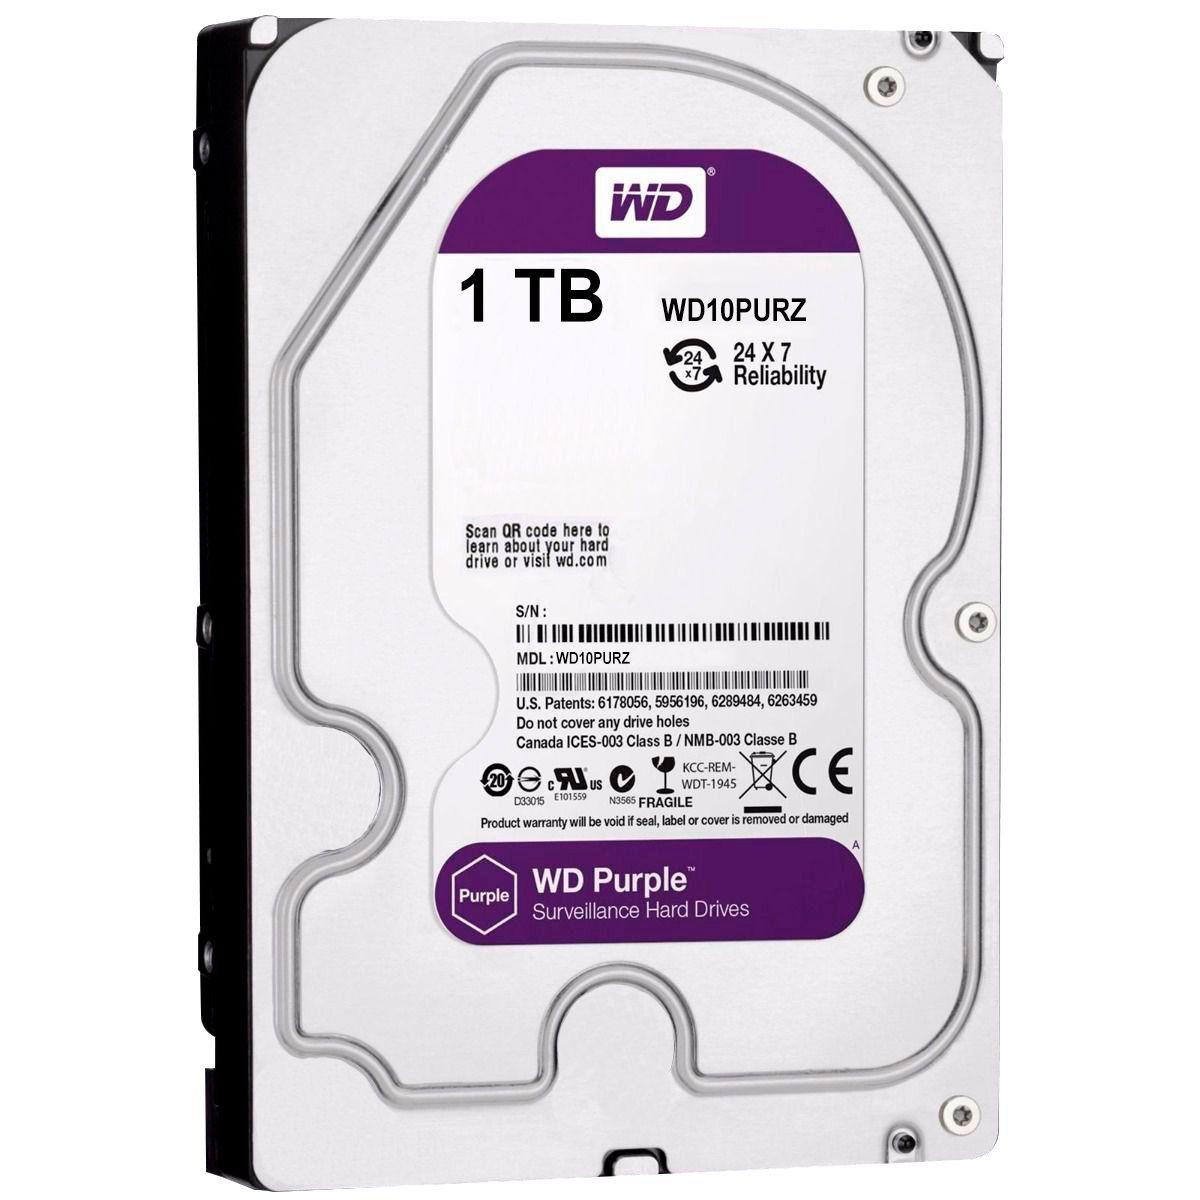 Kit 6 Câmeras de Segurança HD 720p Intelbras VHD 3130 B G6 + DVR Multi HD + HD 1TB + Acessórios